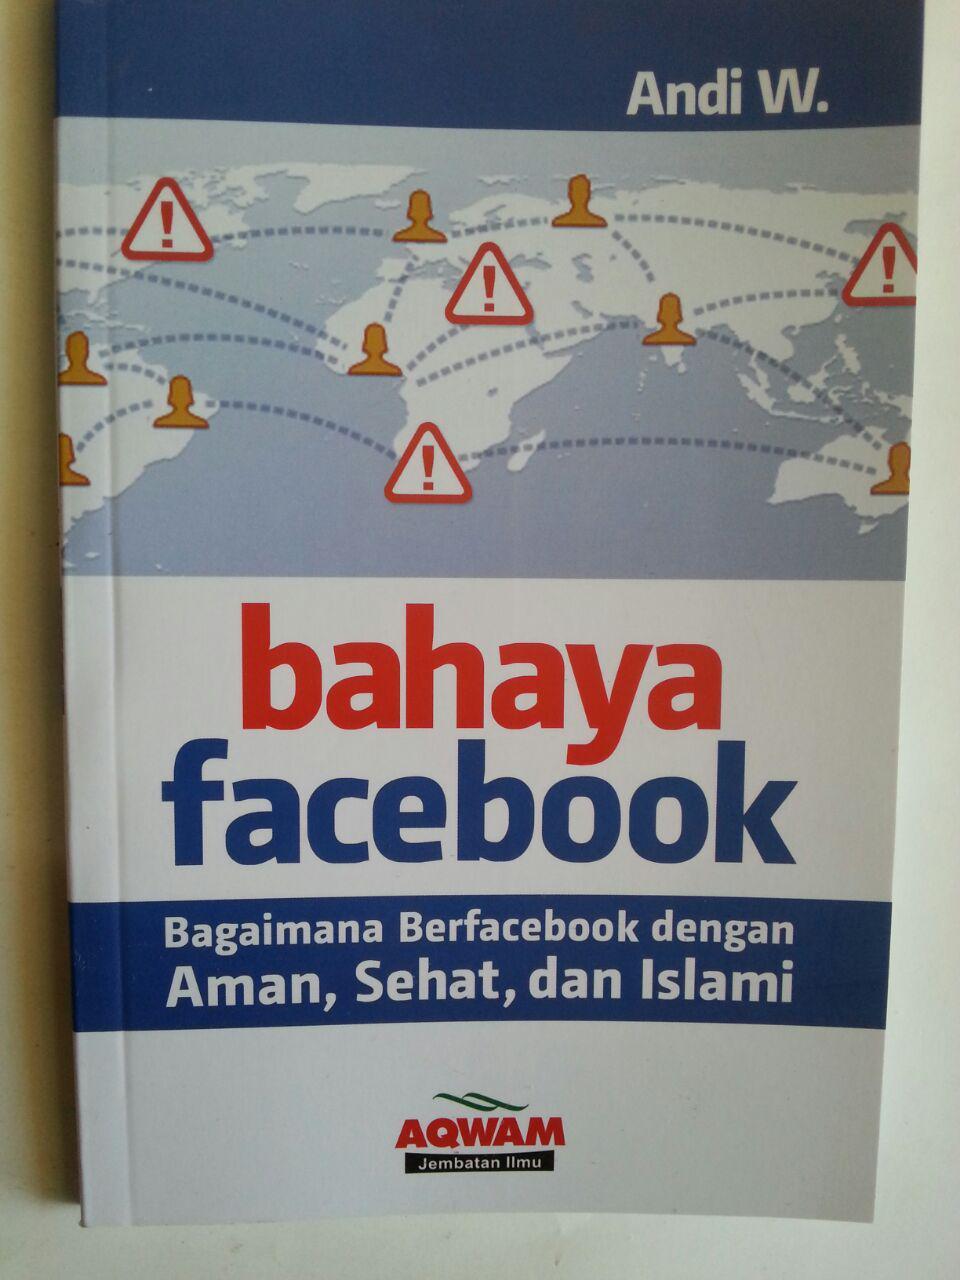 Buku Bahaya Facebook Bagaimana Berfacebook Dengan Aman Sehat Islami cover 2